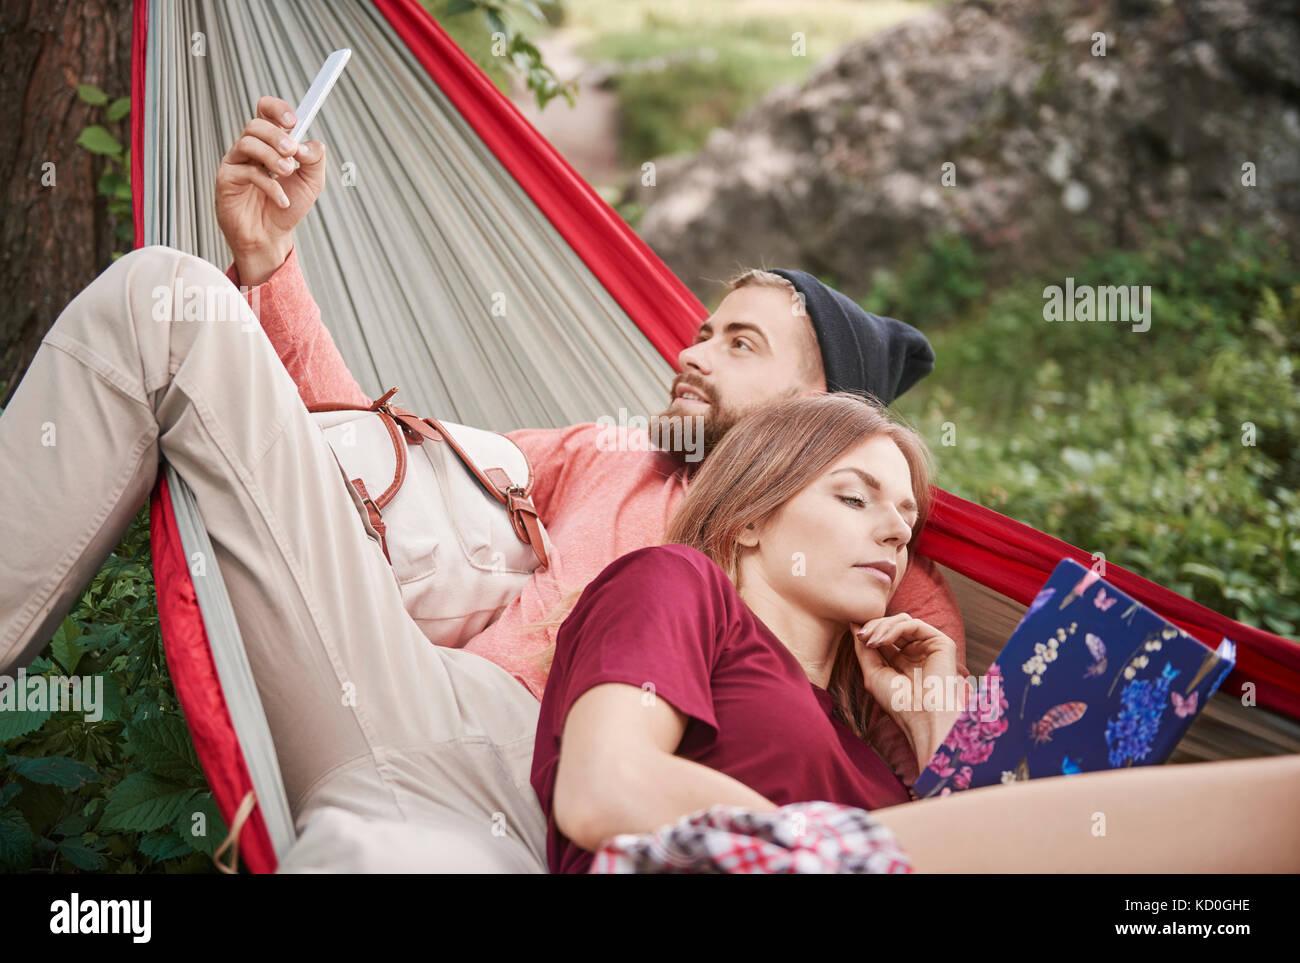 Couple relaxing in hammock, Krakow, Malopolskie, Poland, Europe - Stock Image